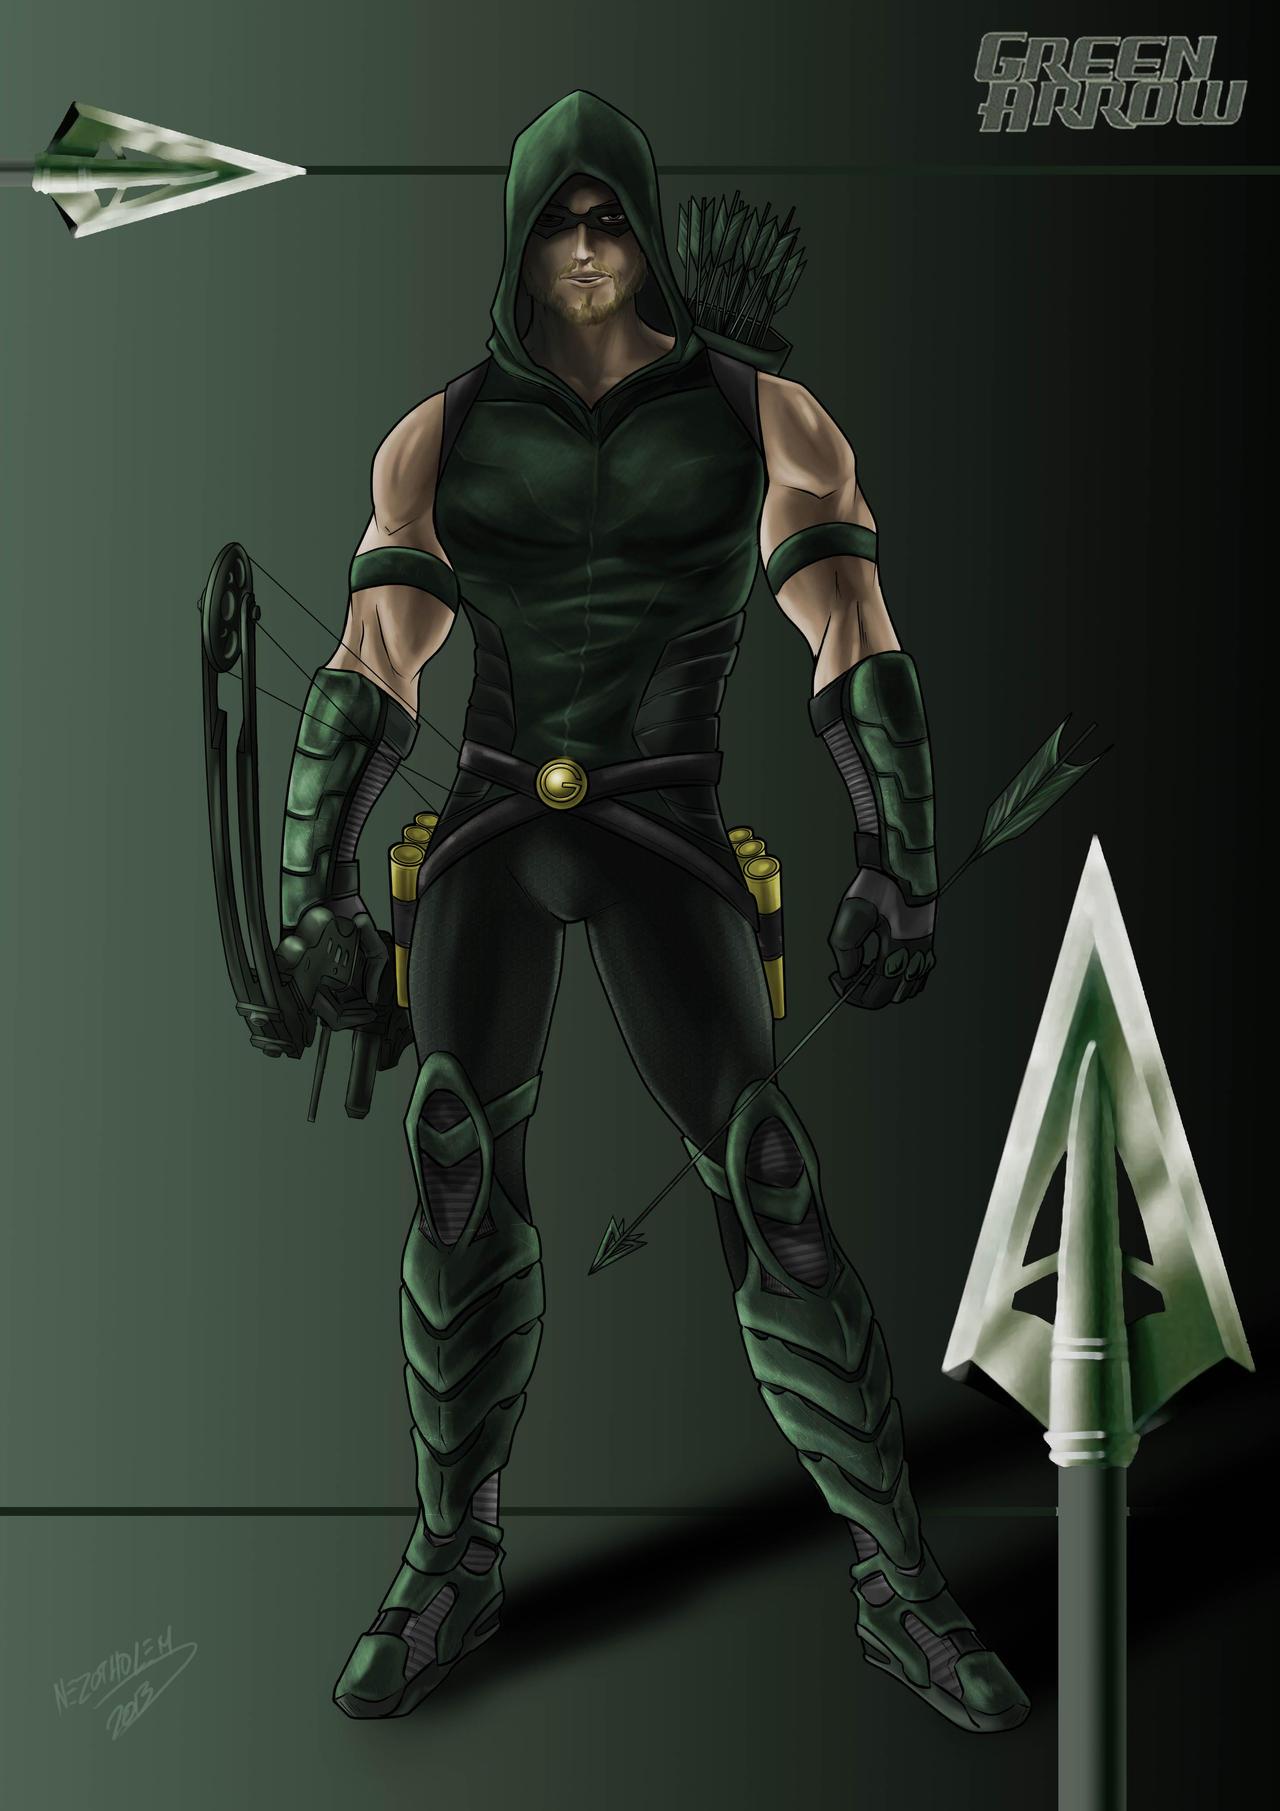 Green Arrow New 52 Wallpaper Green Arrow by Nezotho...